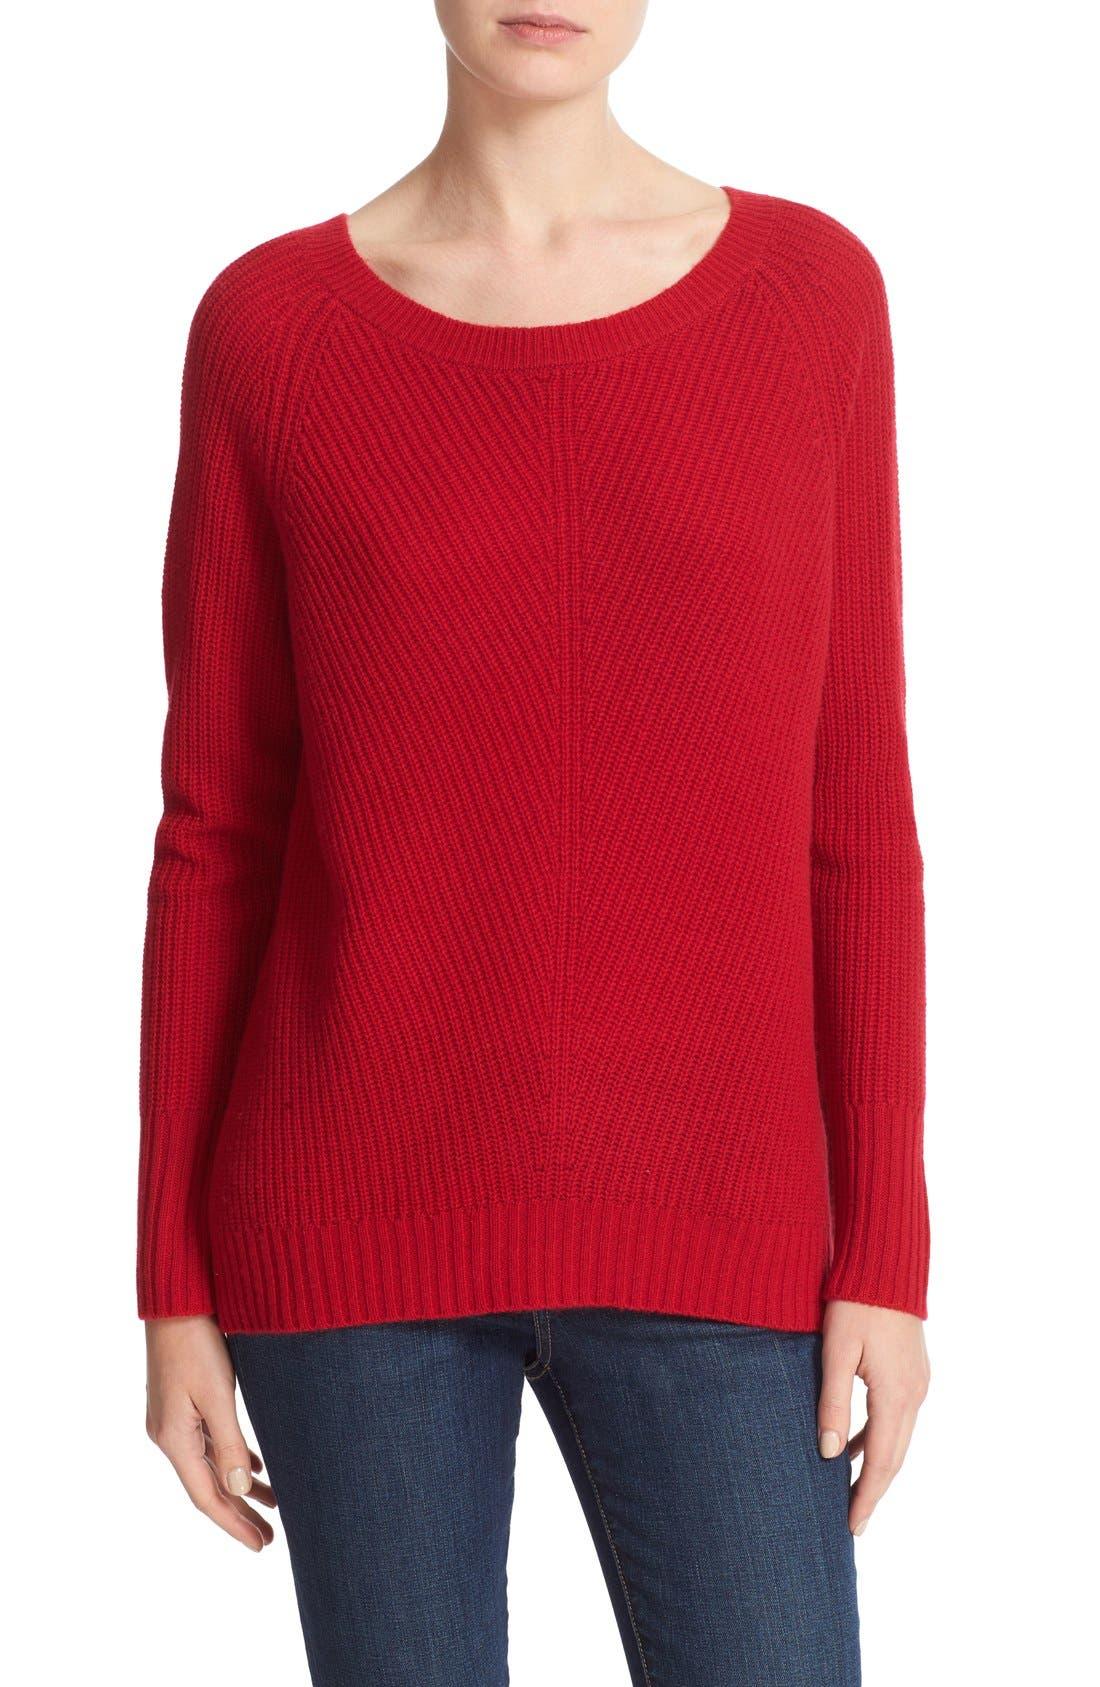 Ekin Wool & Cashmere Sweater,                             Main thumbnail 1, color,                             Ruby